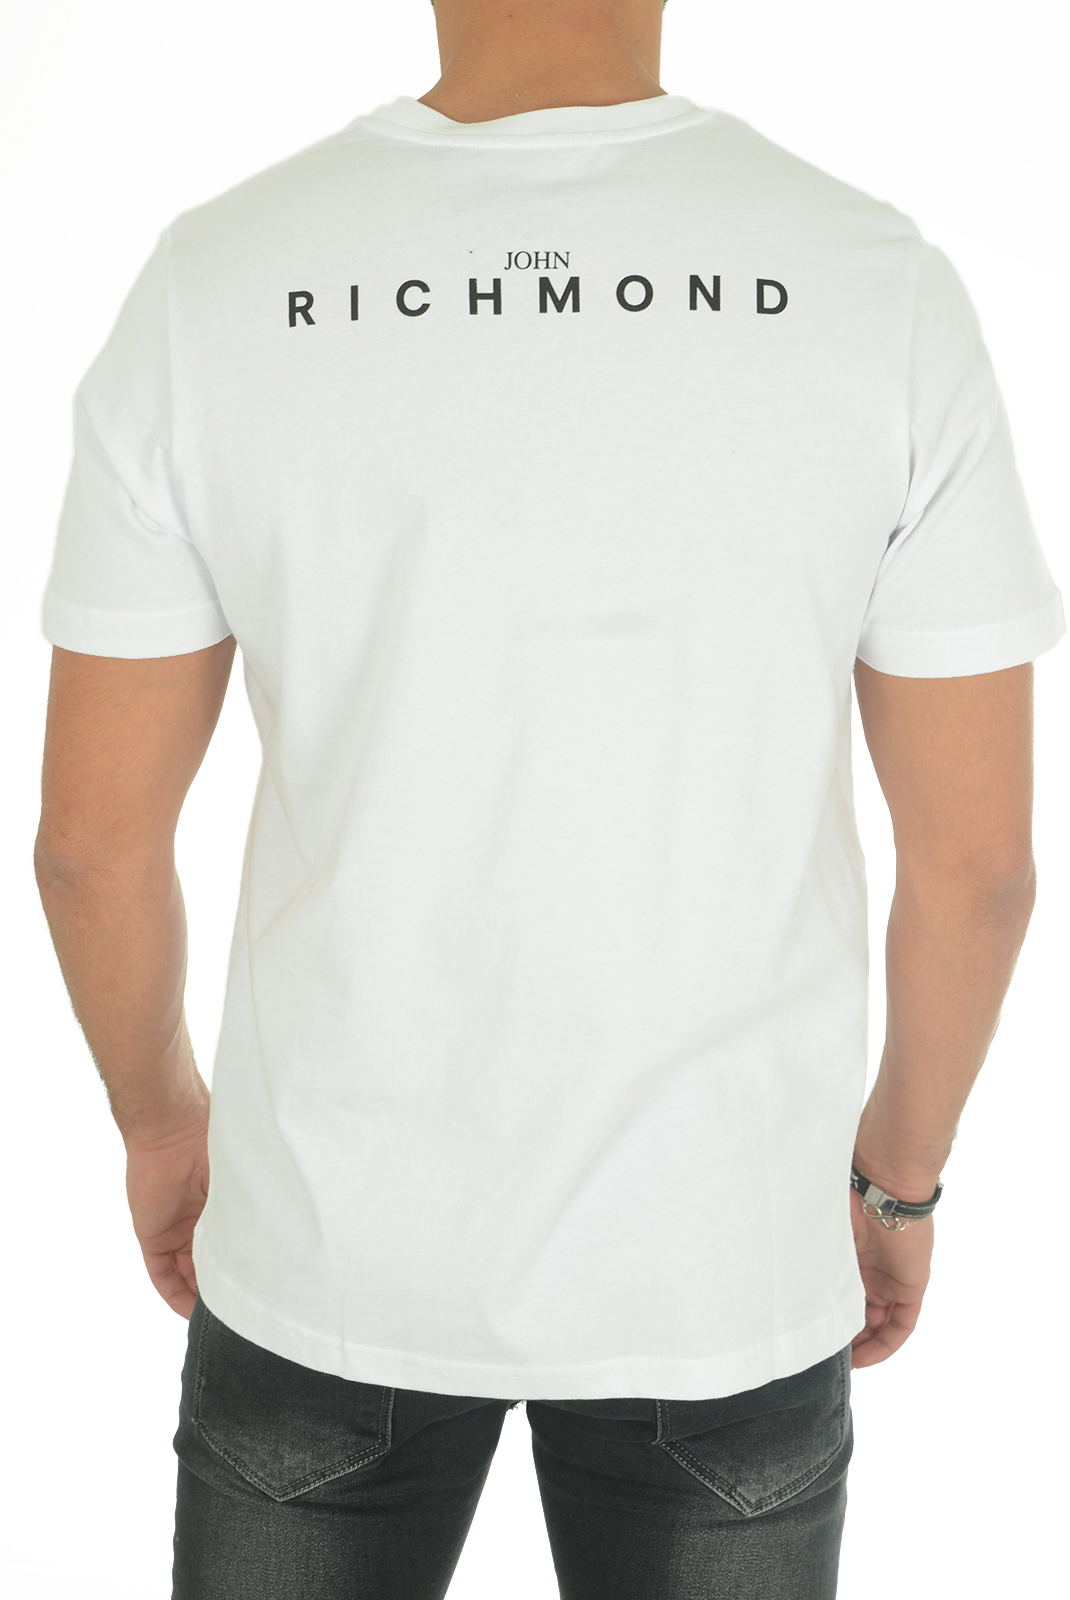 Tee-shirts  John richmond CURVELADIA W0019 BLANC